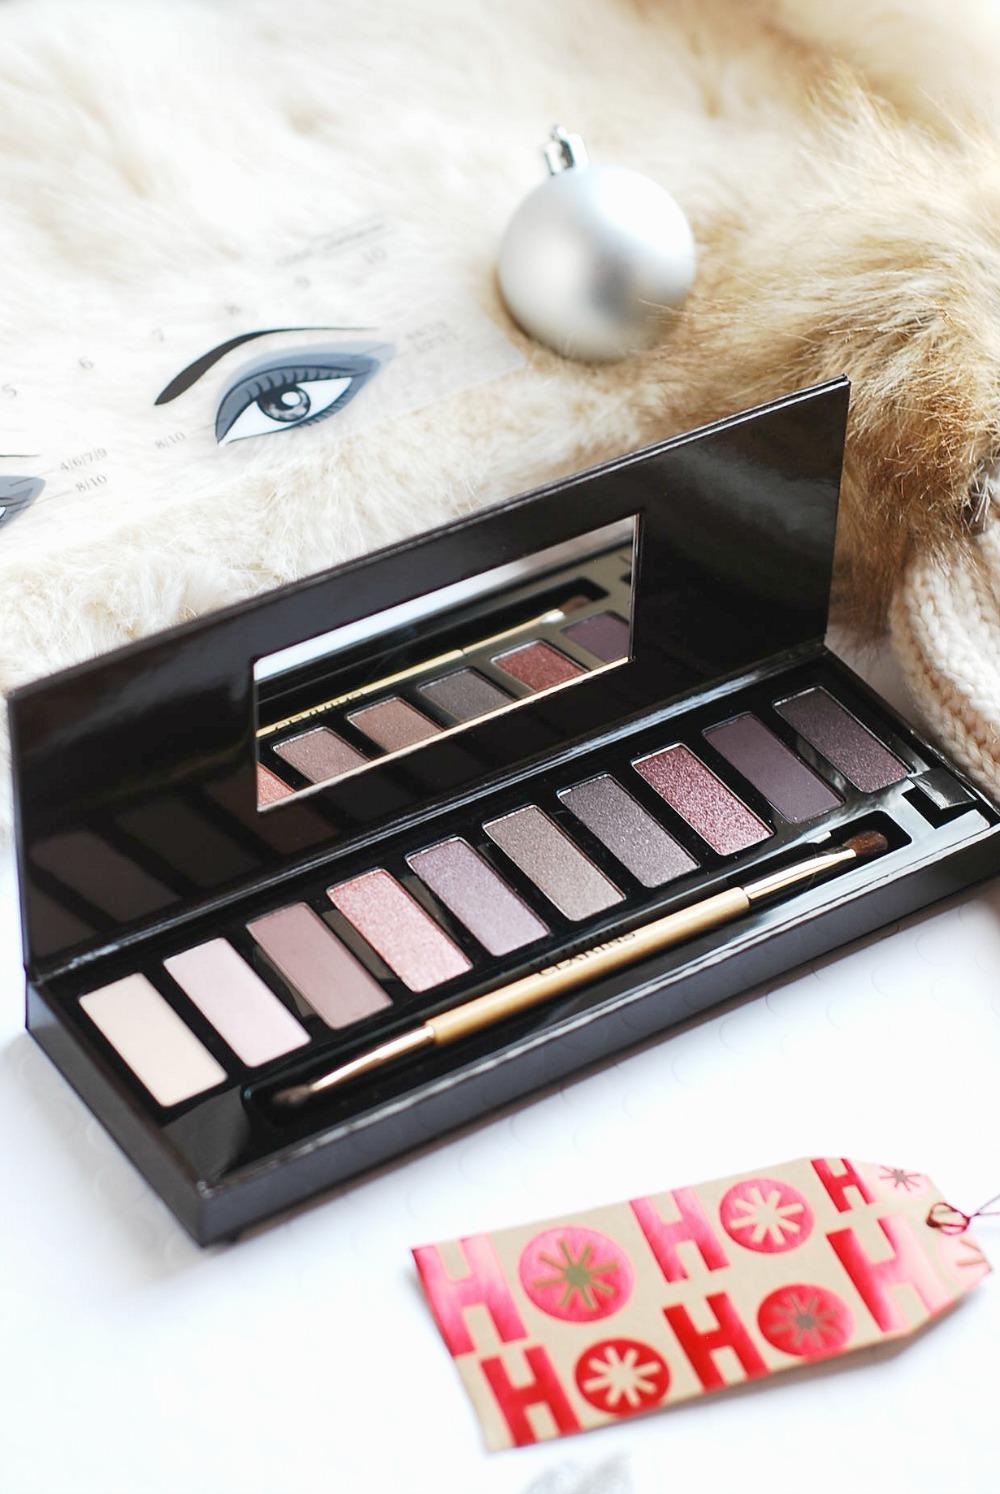 Clarins The Essentials Holiday 2016 Eyeshadow Palette & Swatches